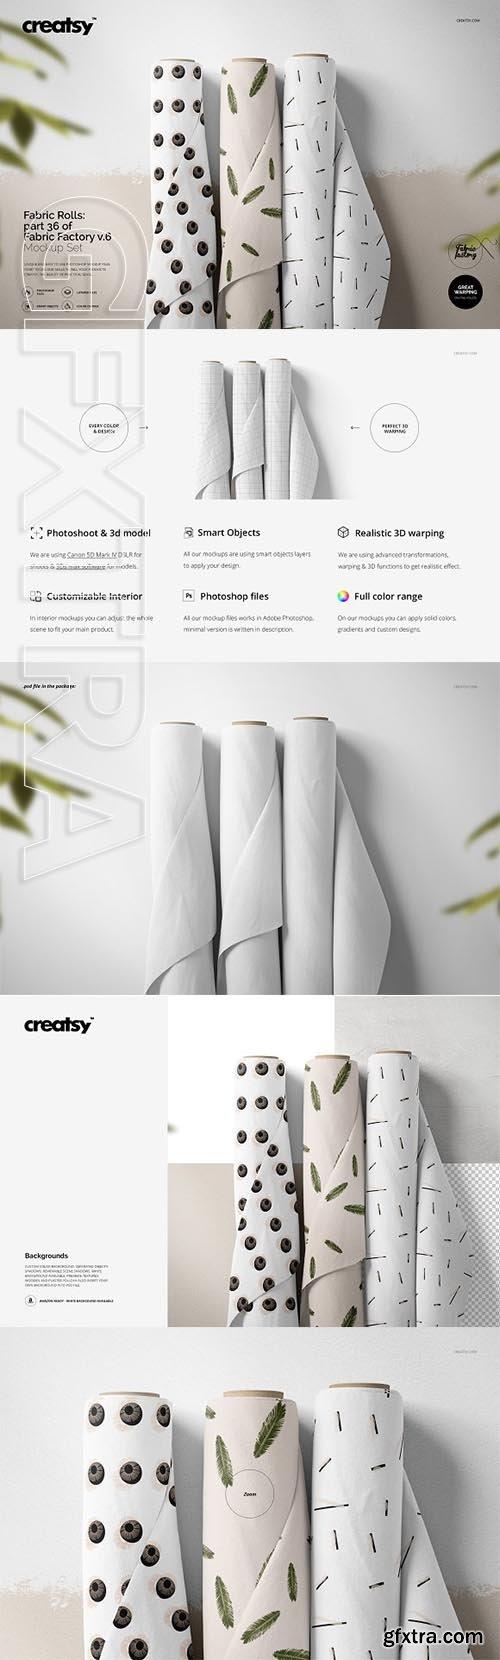 CreativeMarket - Fabric Rolls Mockup 36FF v 6 3334265